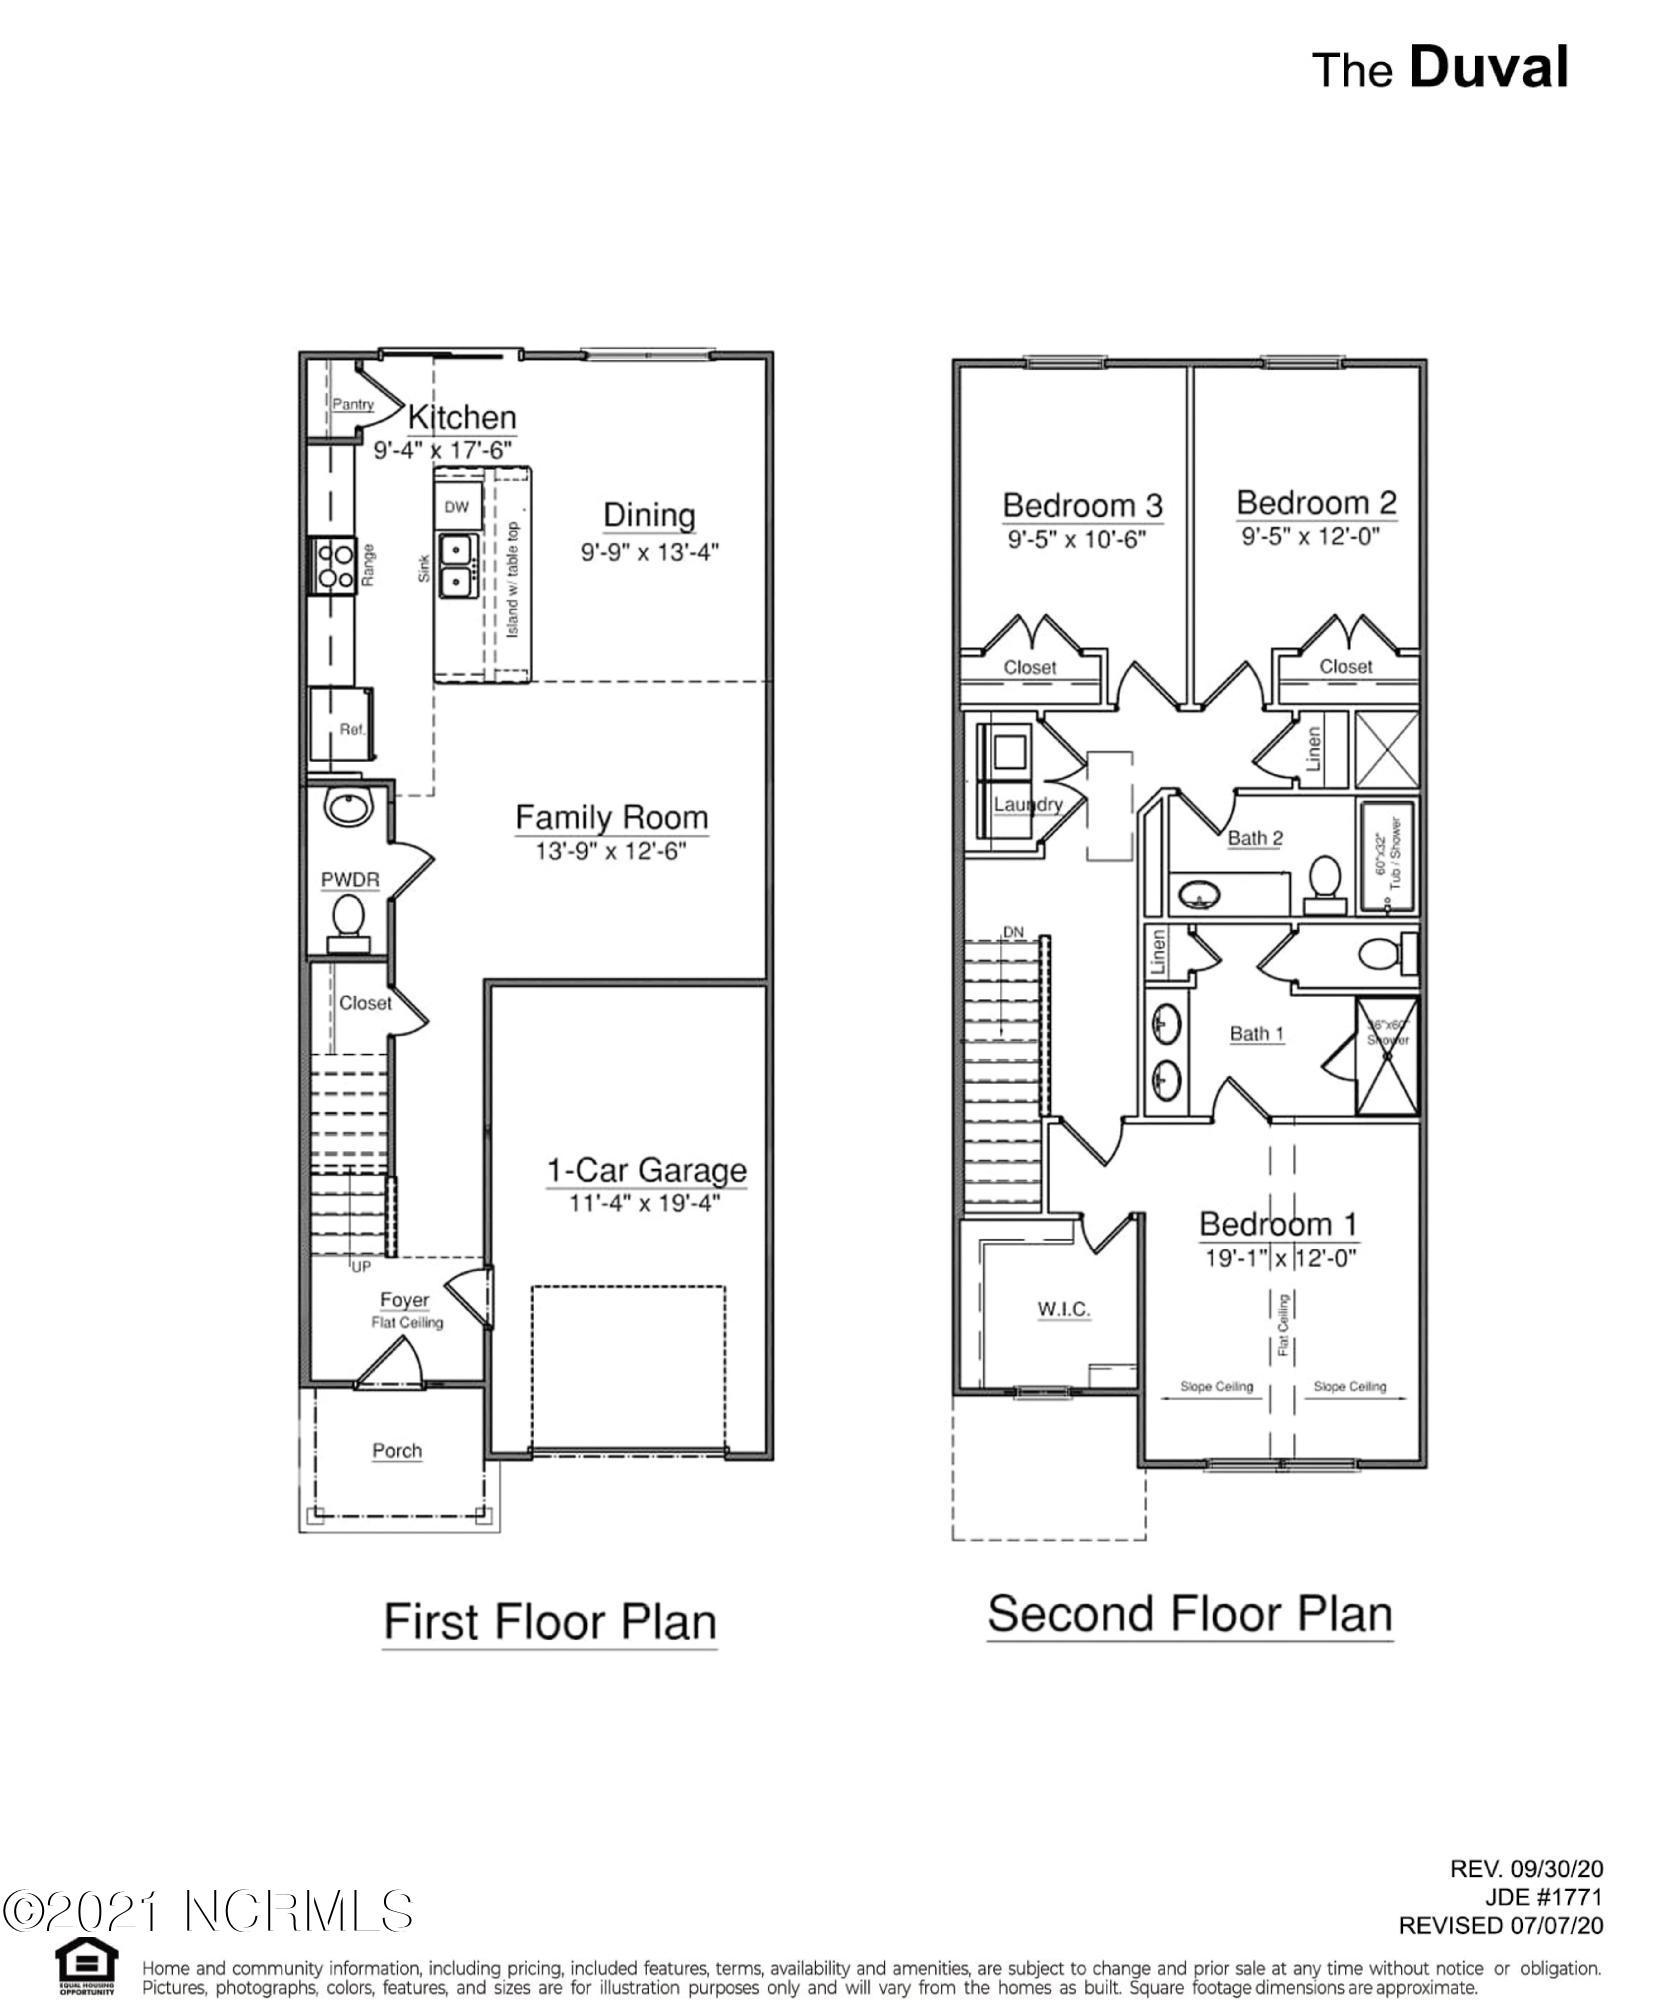 7630 Knightbell Circle, Leland, North Carolina 28451, 3 Bedrooms Bedrooms, 6 Rooms Rooms,2 BathroomsBathrooms,Townhouse,For sale,Knightbell,100278420